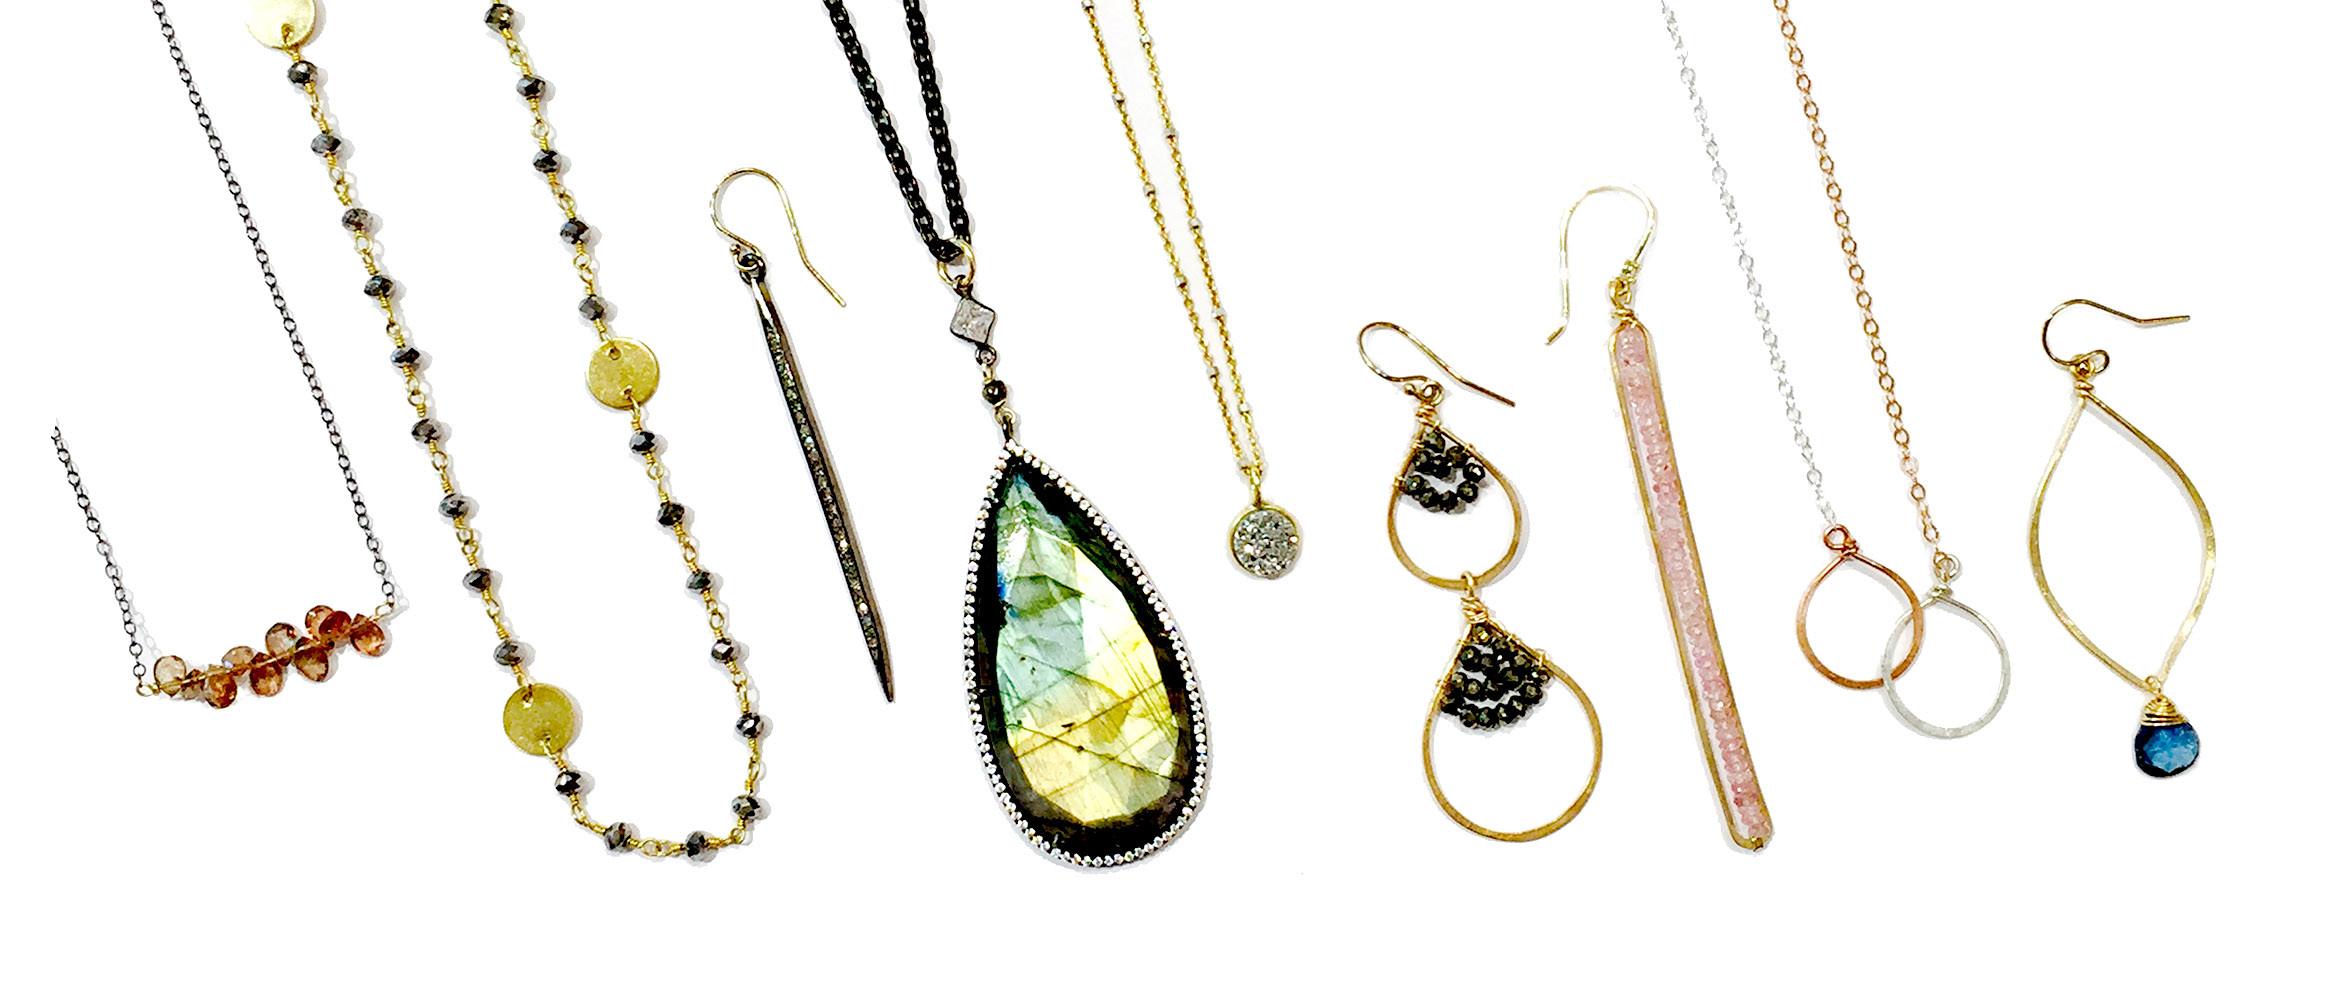 Julie Tuton Jewelry